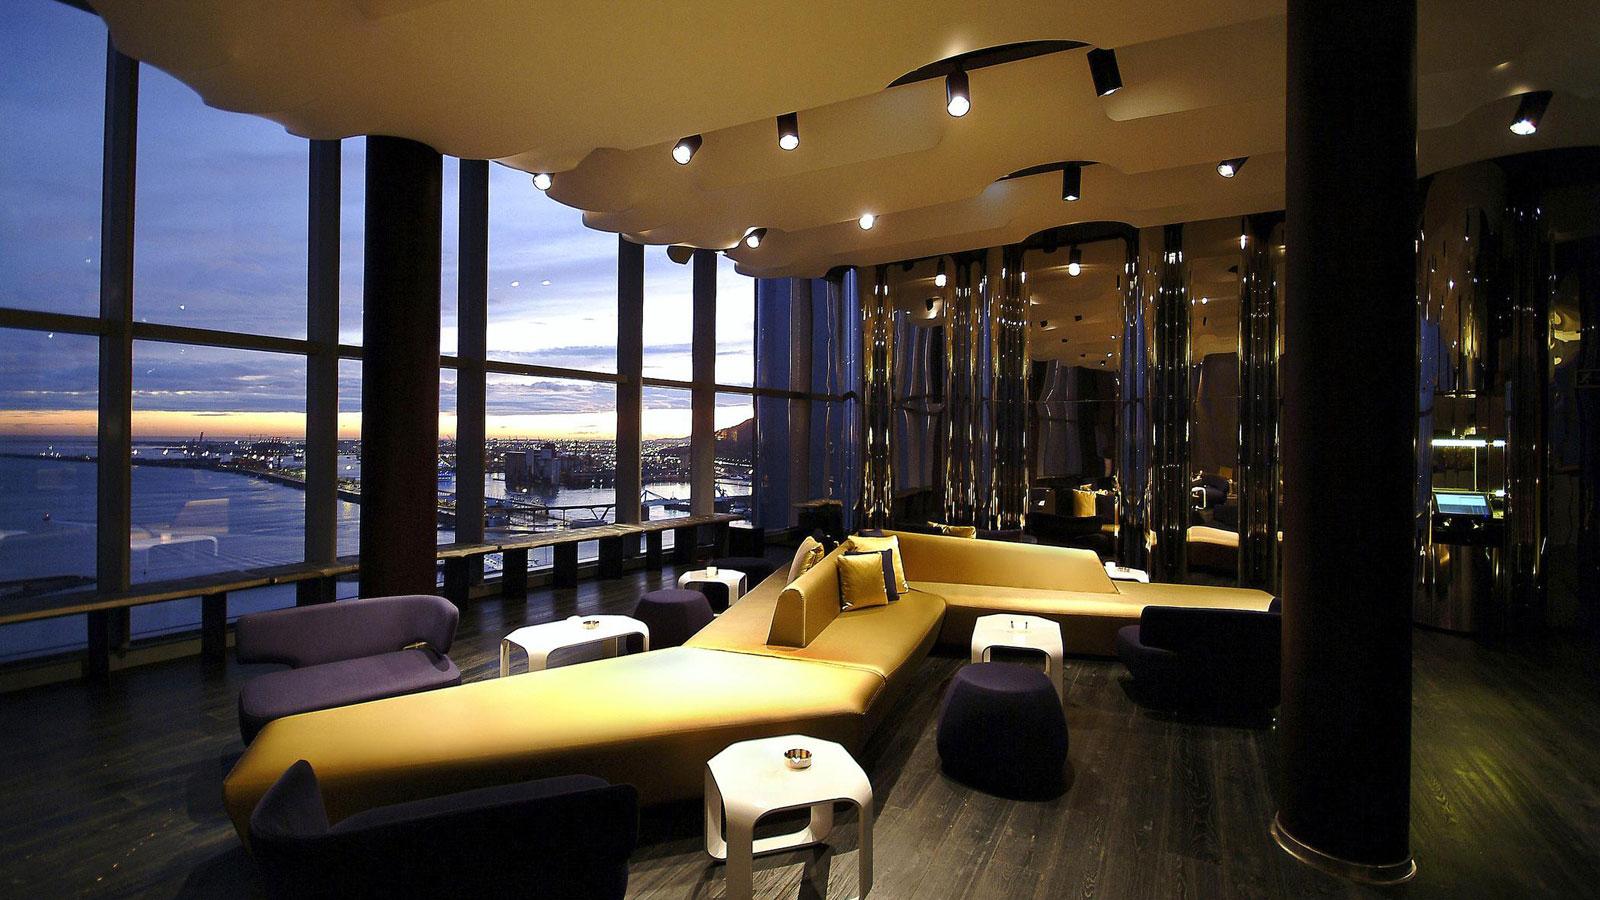 The W Hotel in Barcelona by Ricardo Bofill  Architecture